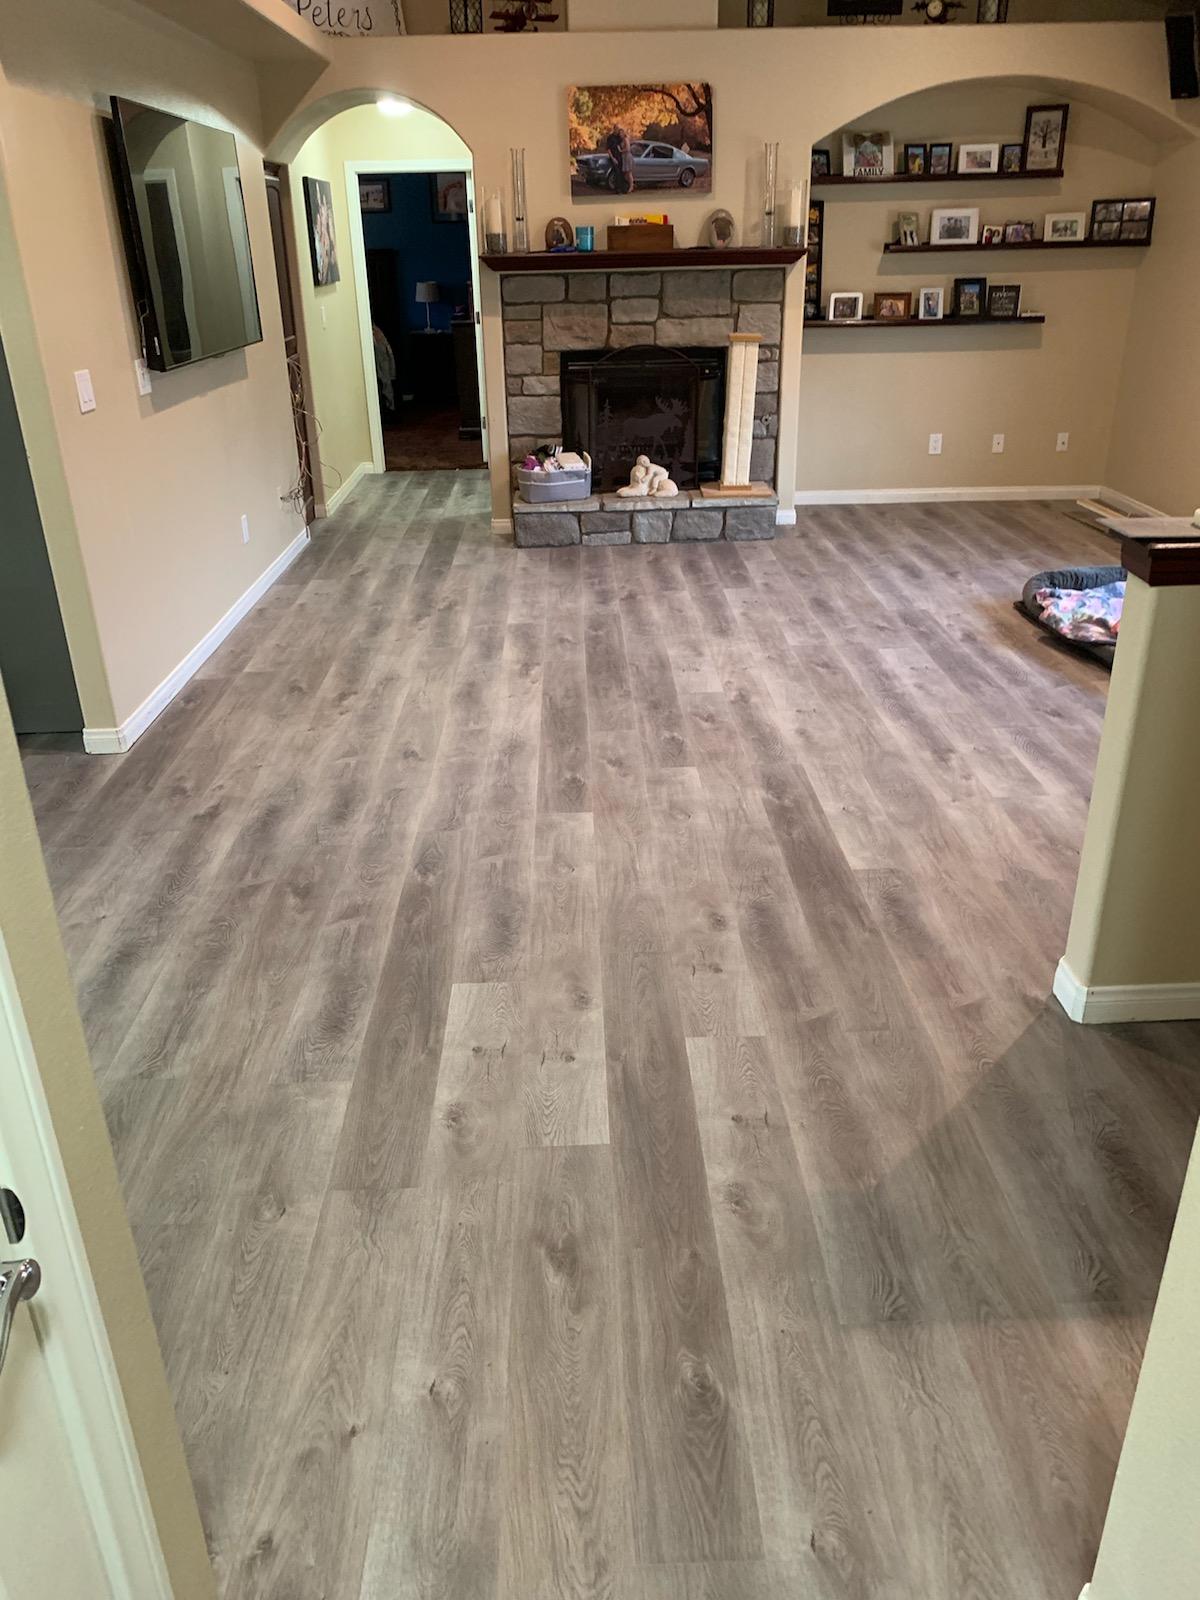 Waterproof Vinyl Flooring and Installation in Hesperia, California